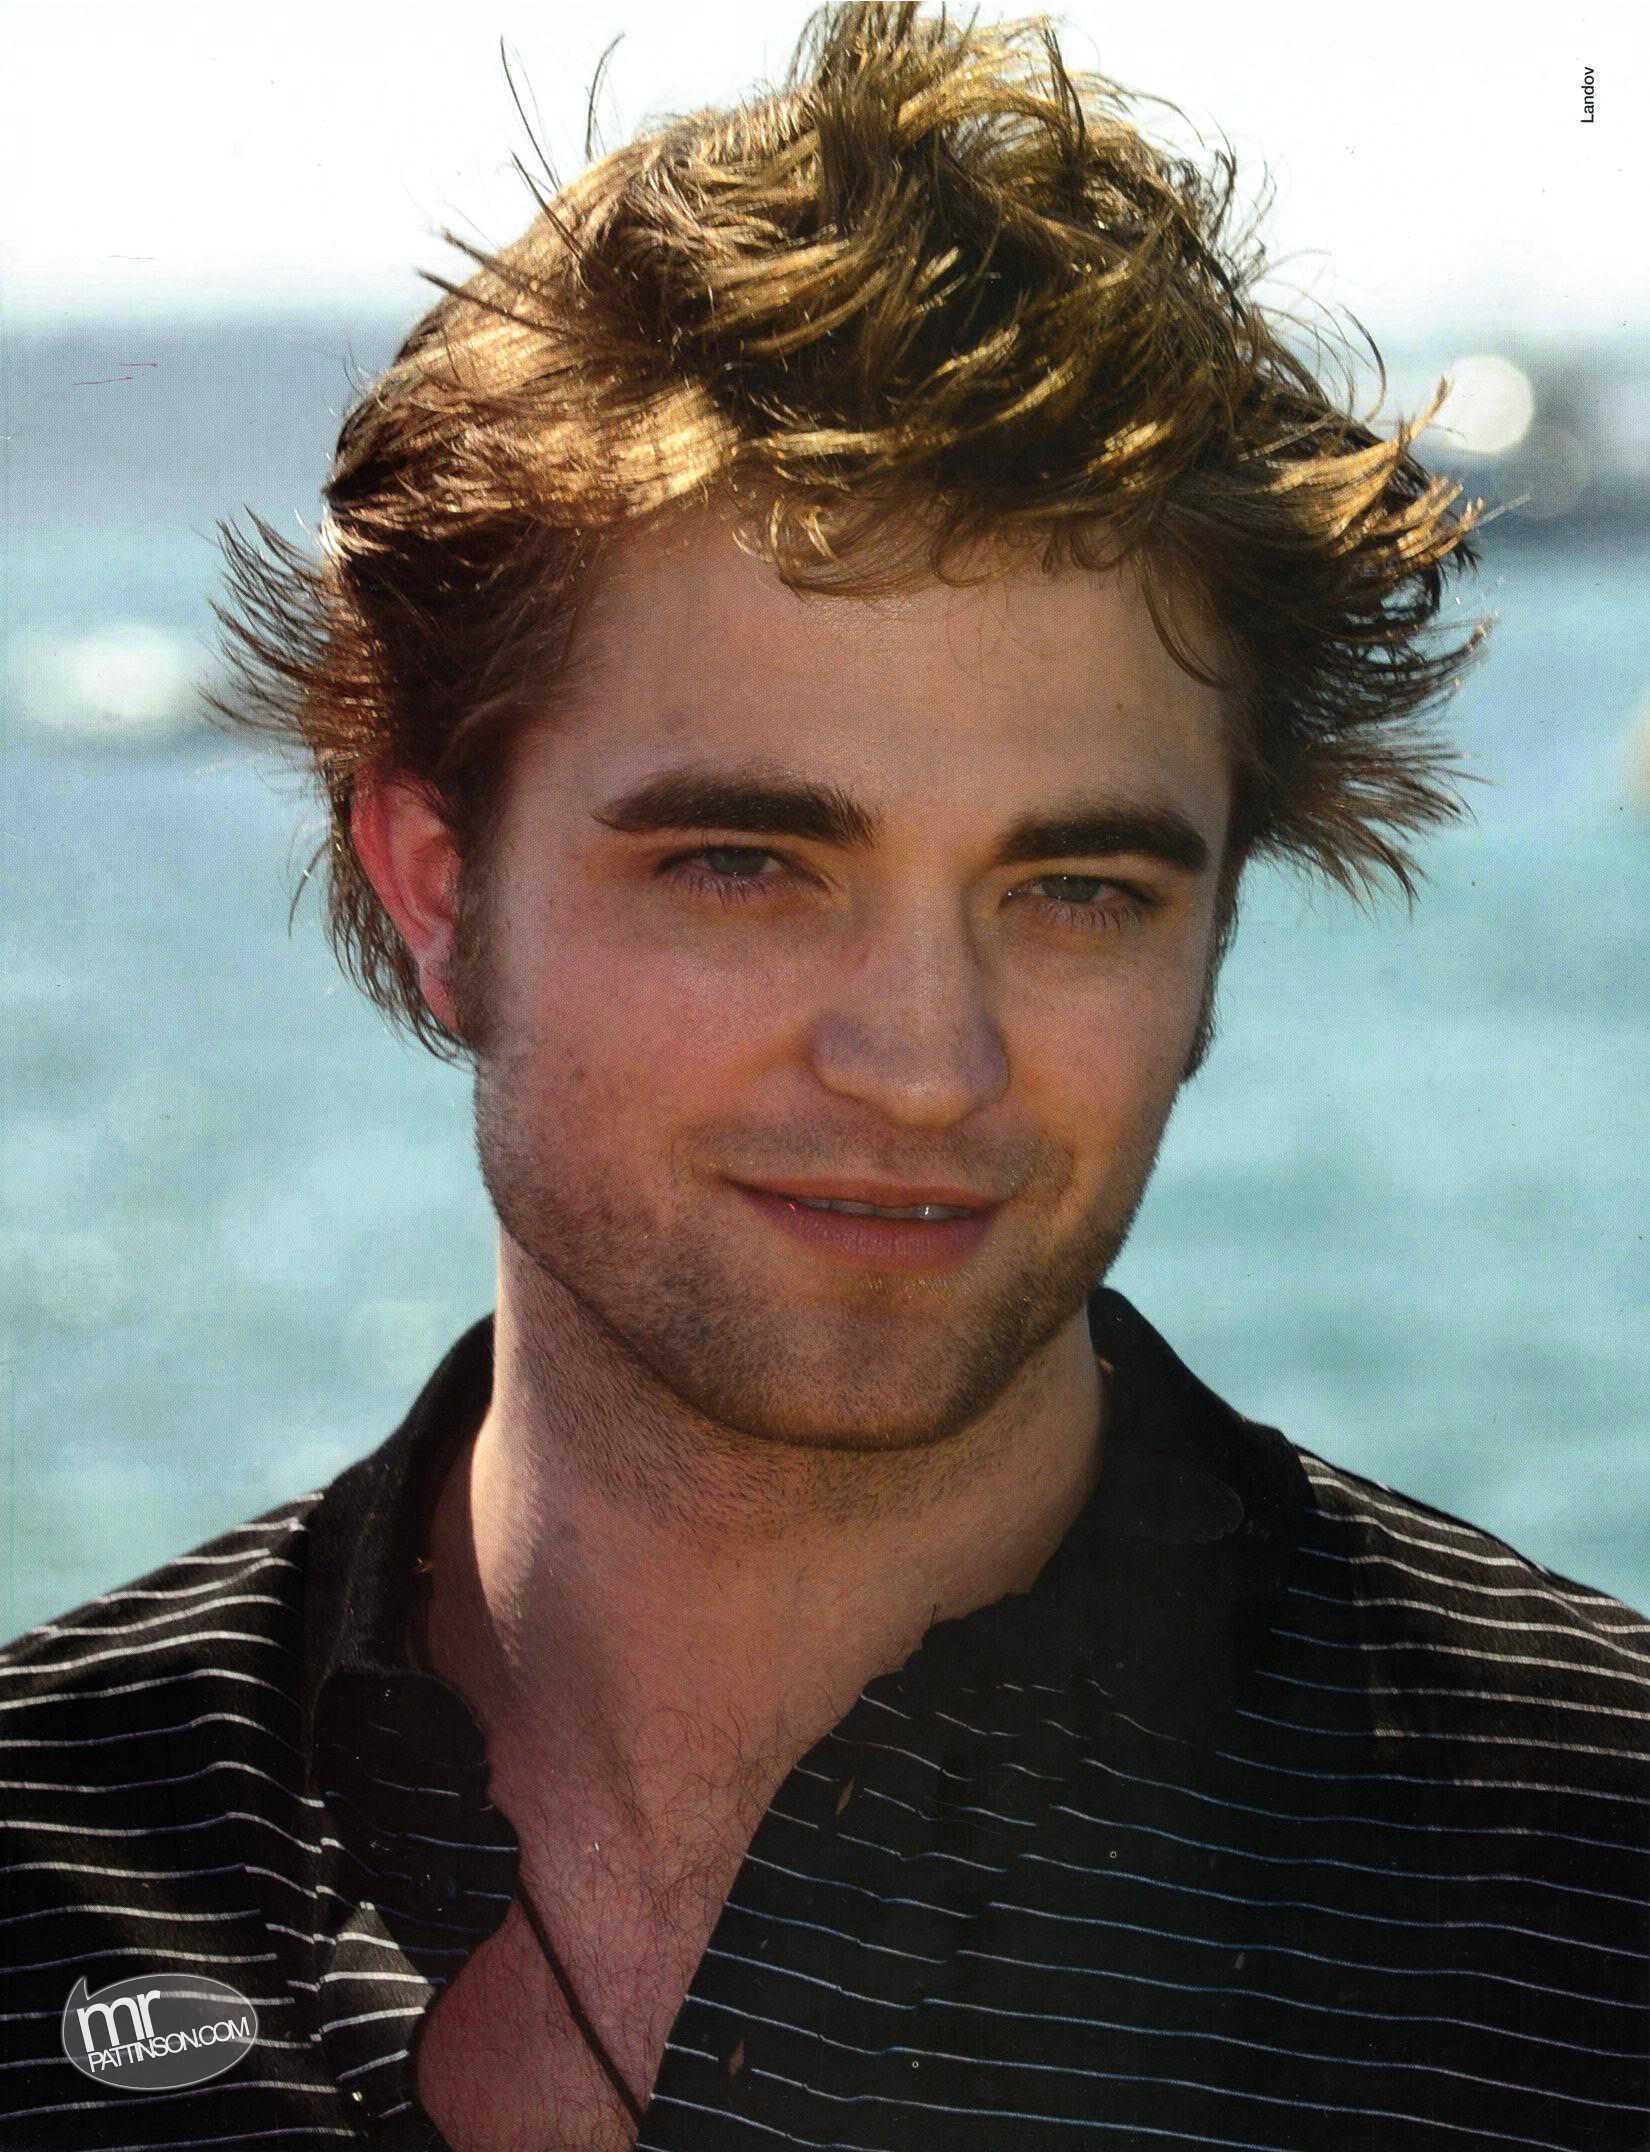 The Ultimate Vampire Tribute To Robert Pattinson